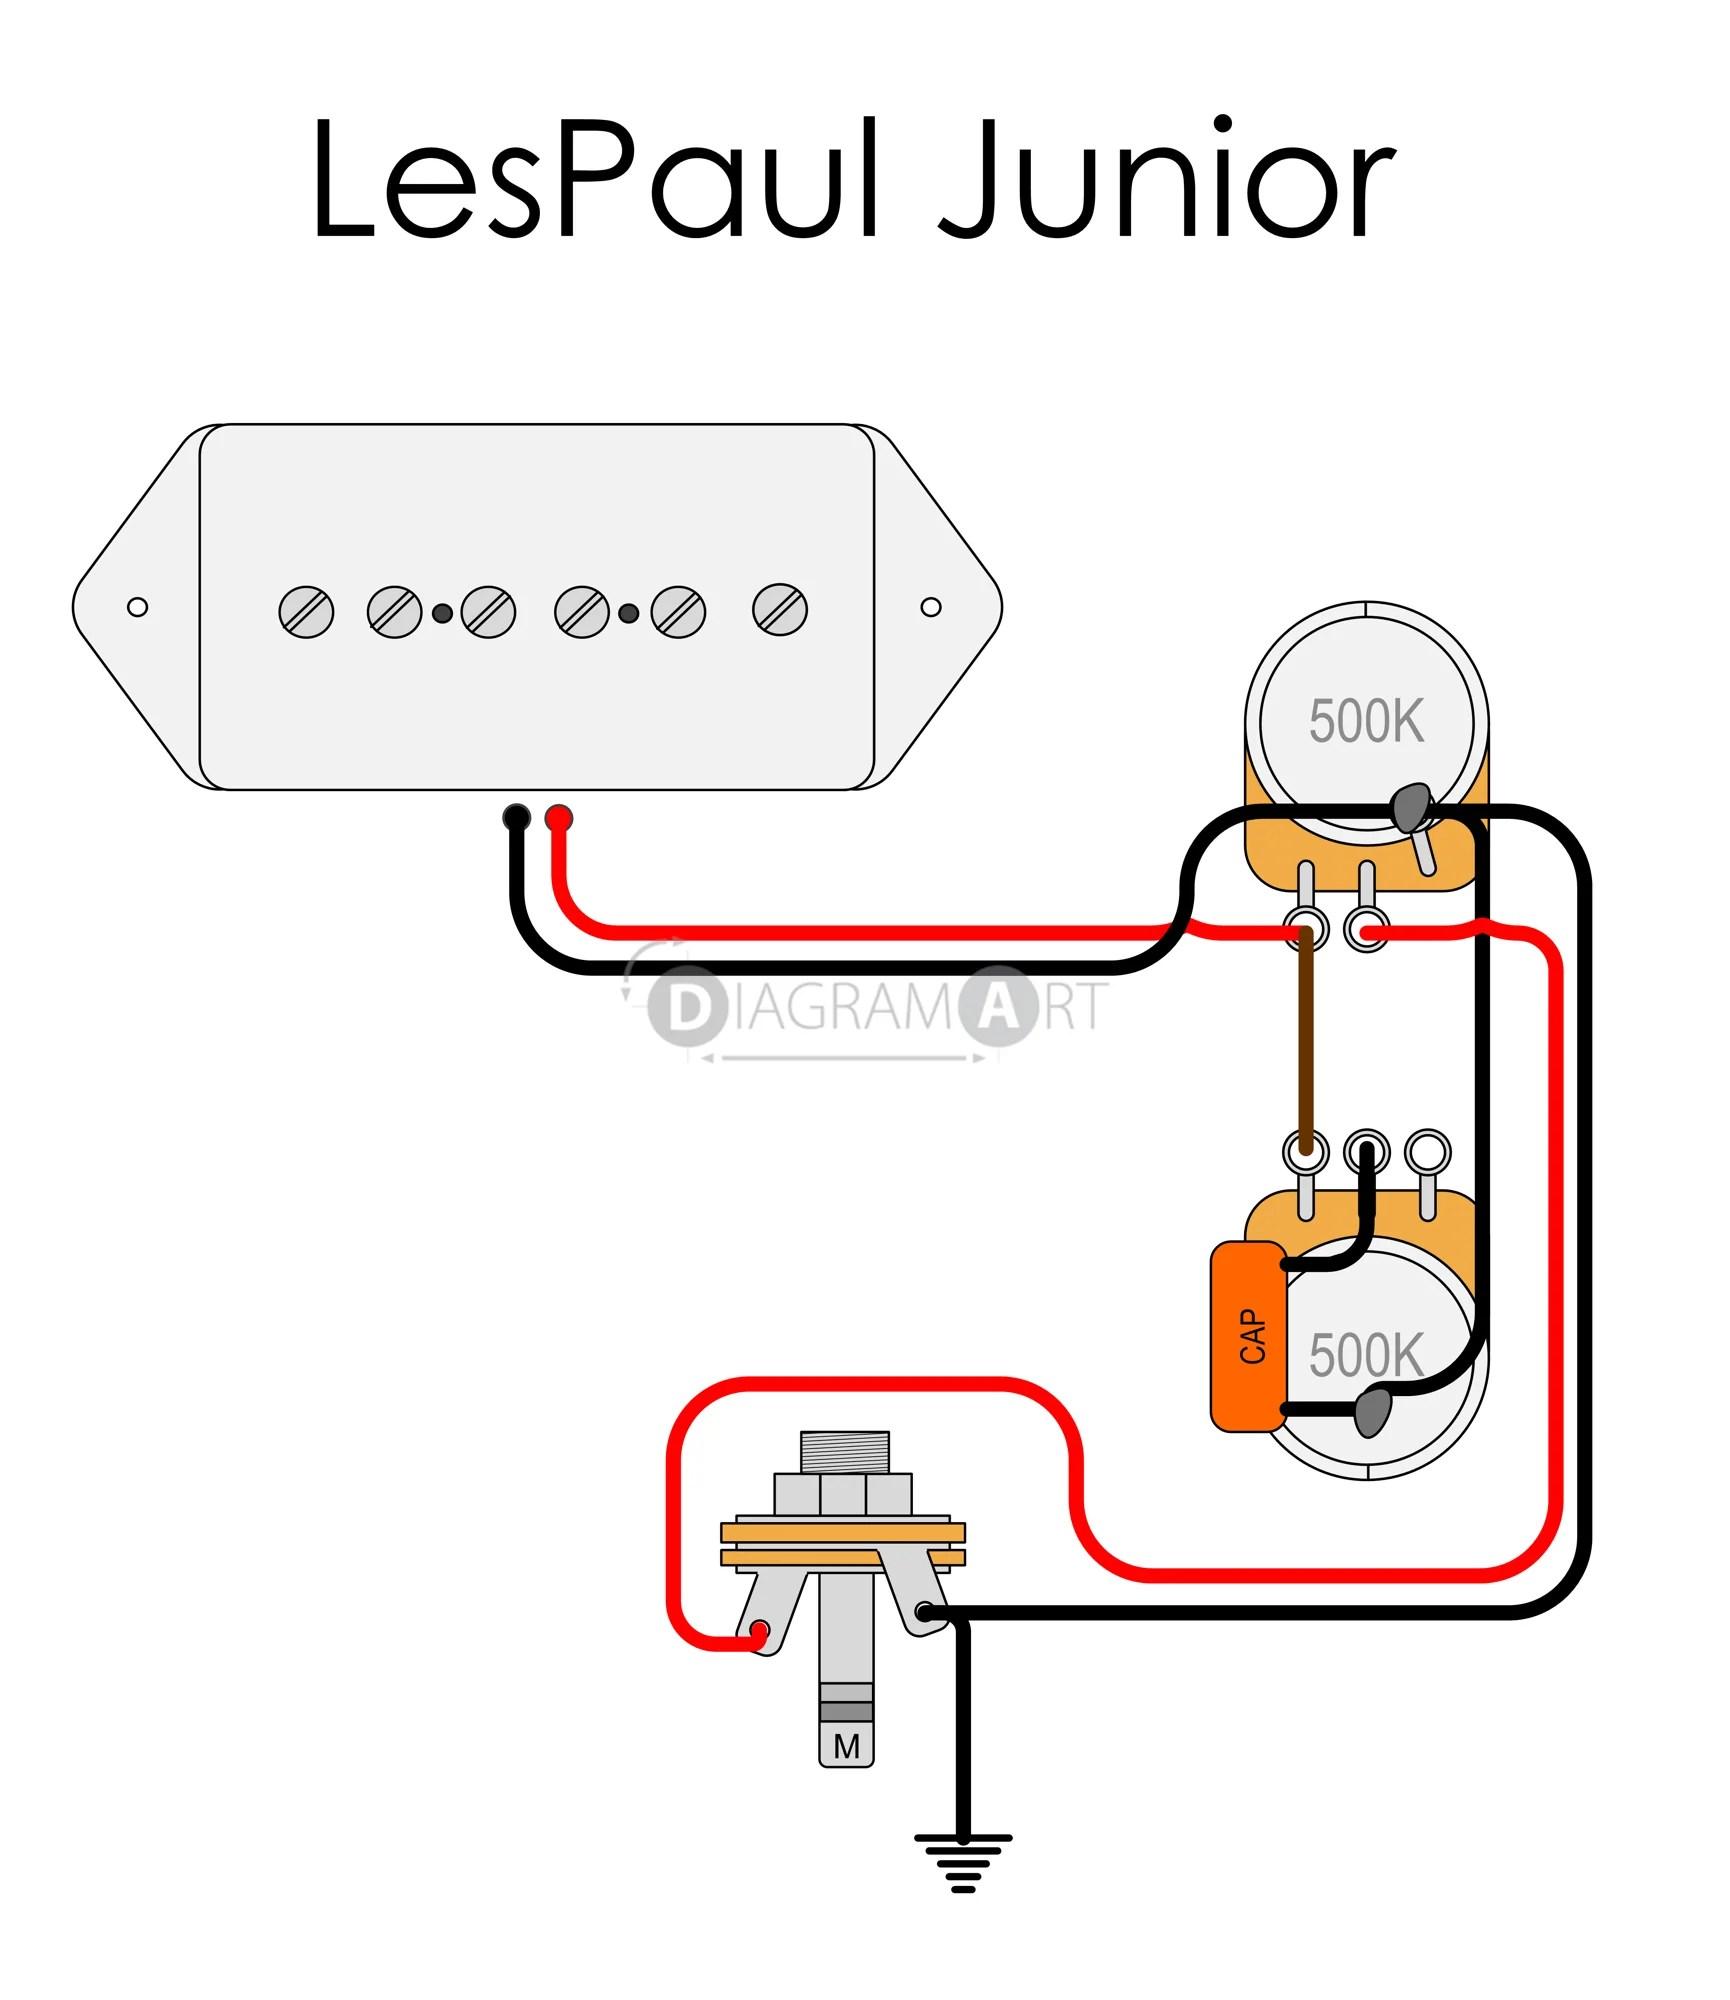 wire diagram electric guitar wiring diagram name yamaha electric guitar wiring diagram electric guitars wiring diagrams [ 1730 x 2000 Pixel ]